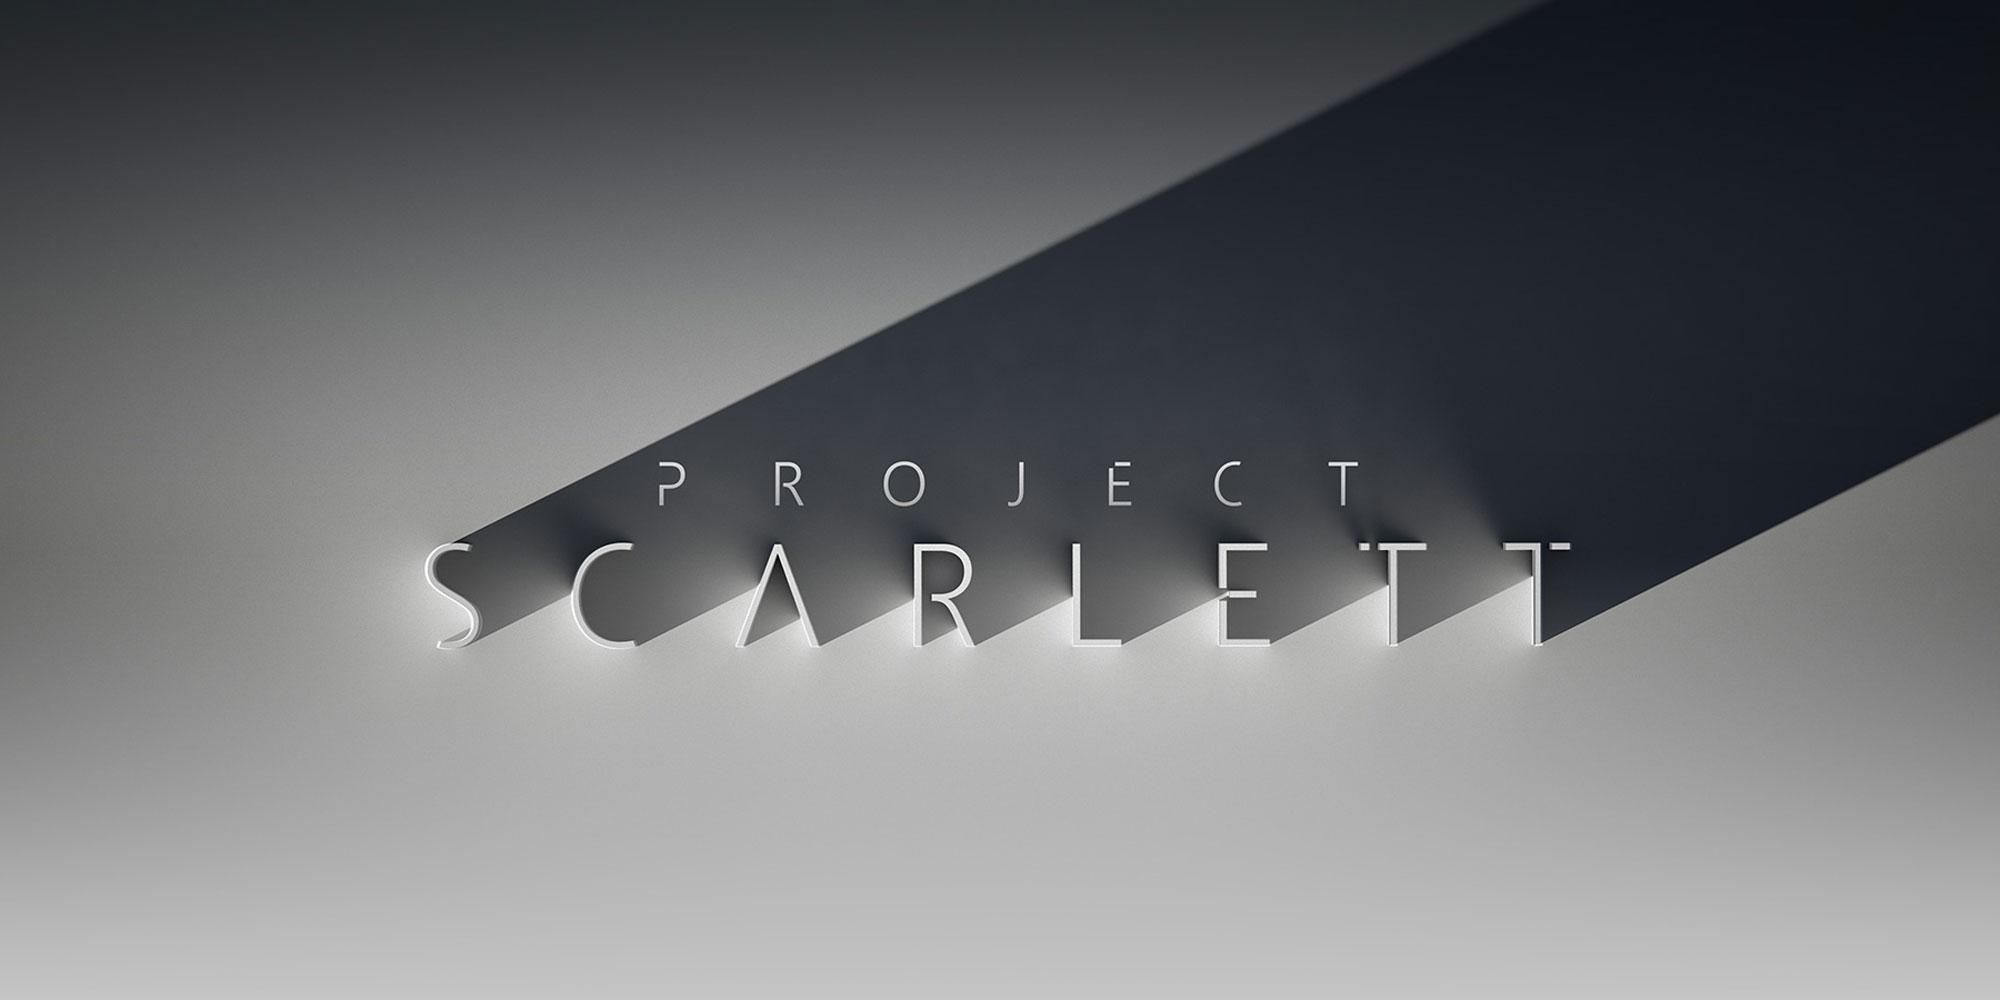 xbox all access project scarlett